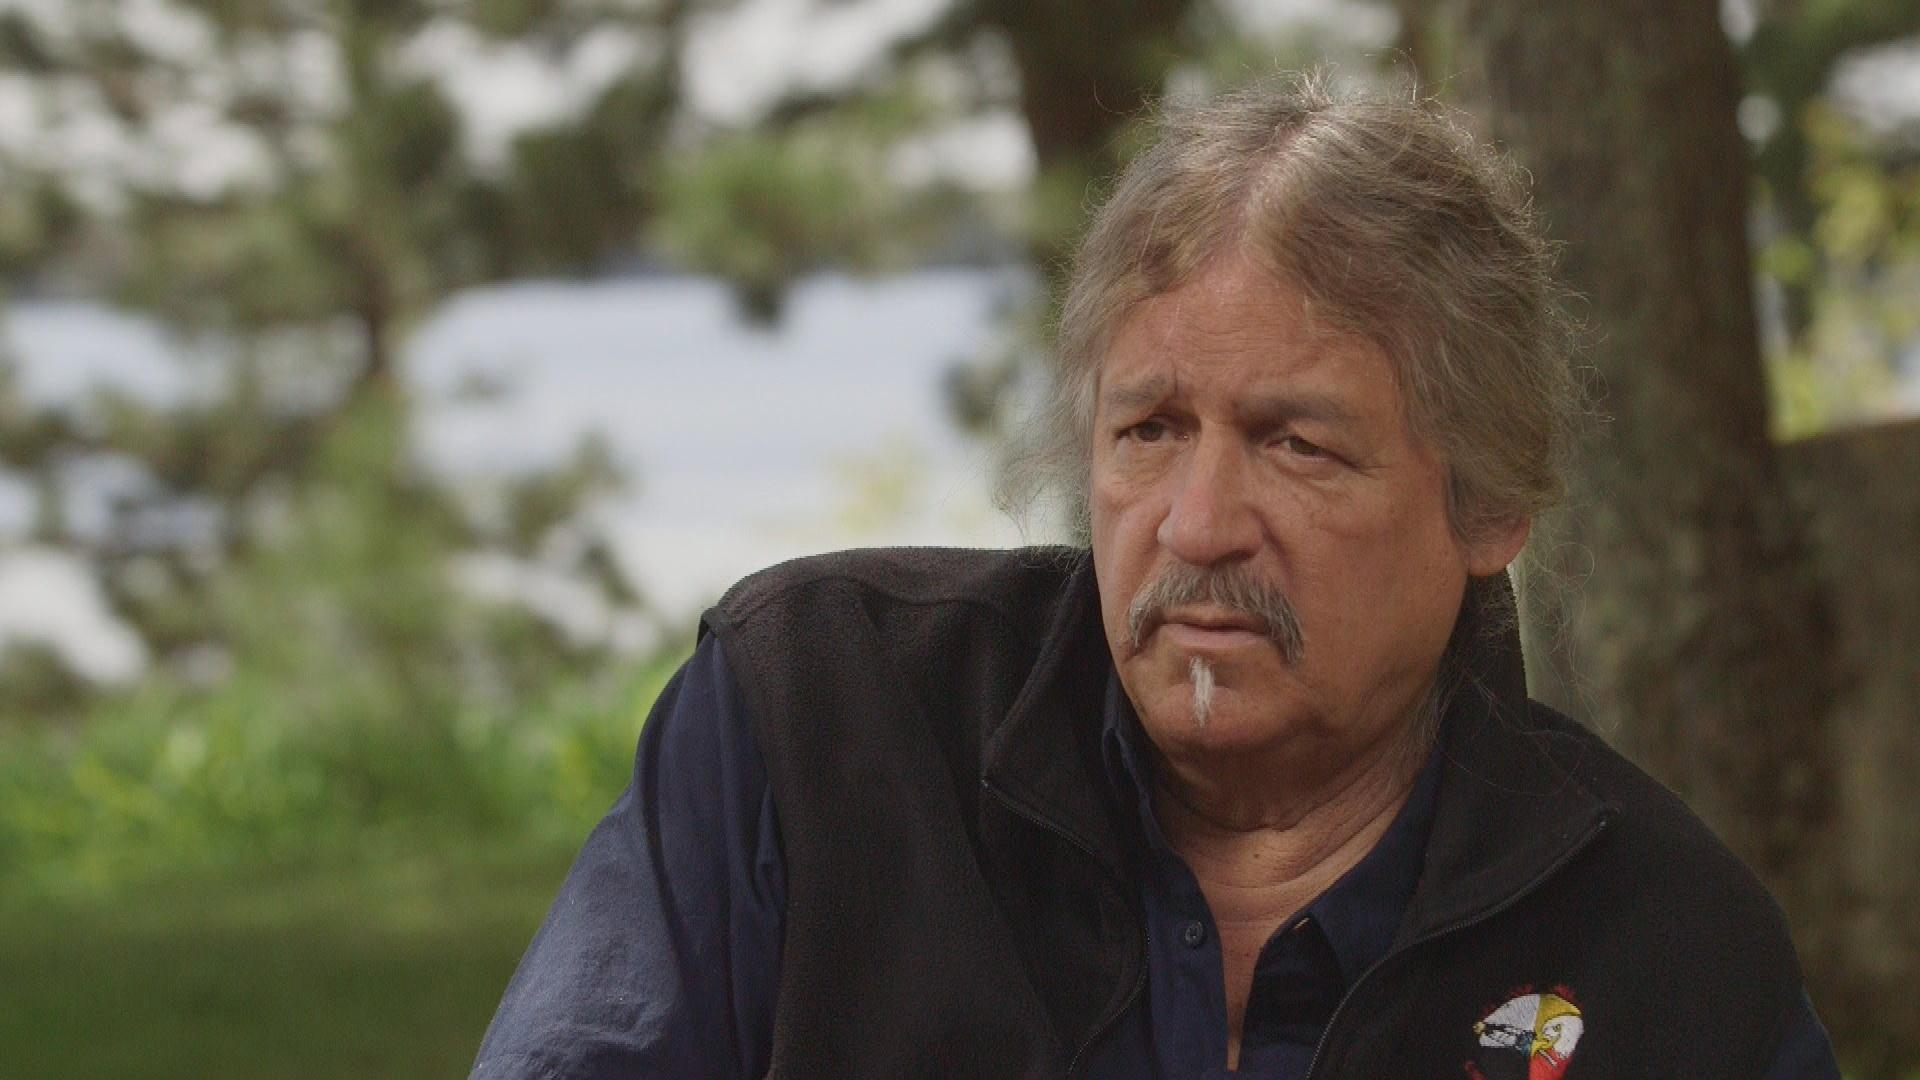 Tribal Histories : Lac Courte Oreilles Ojibwe History